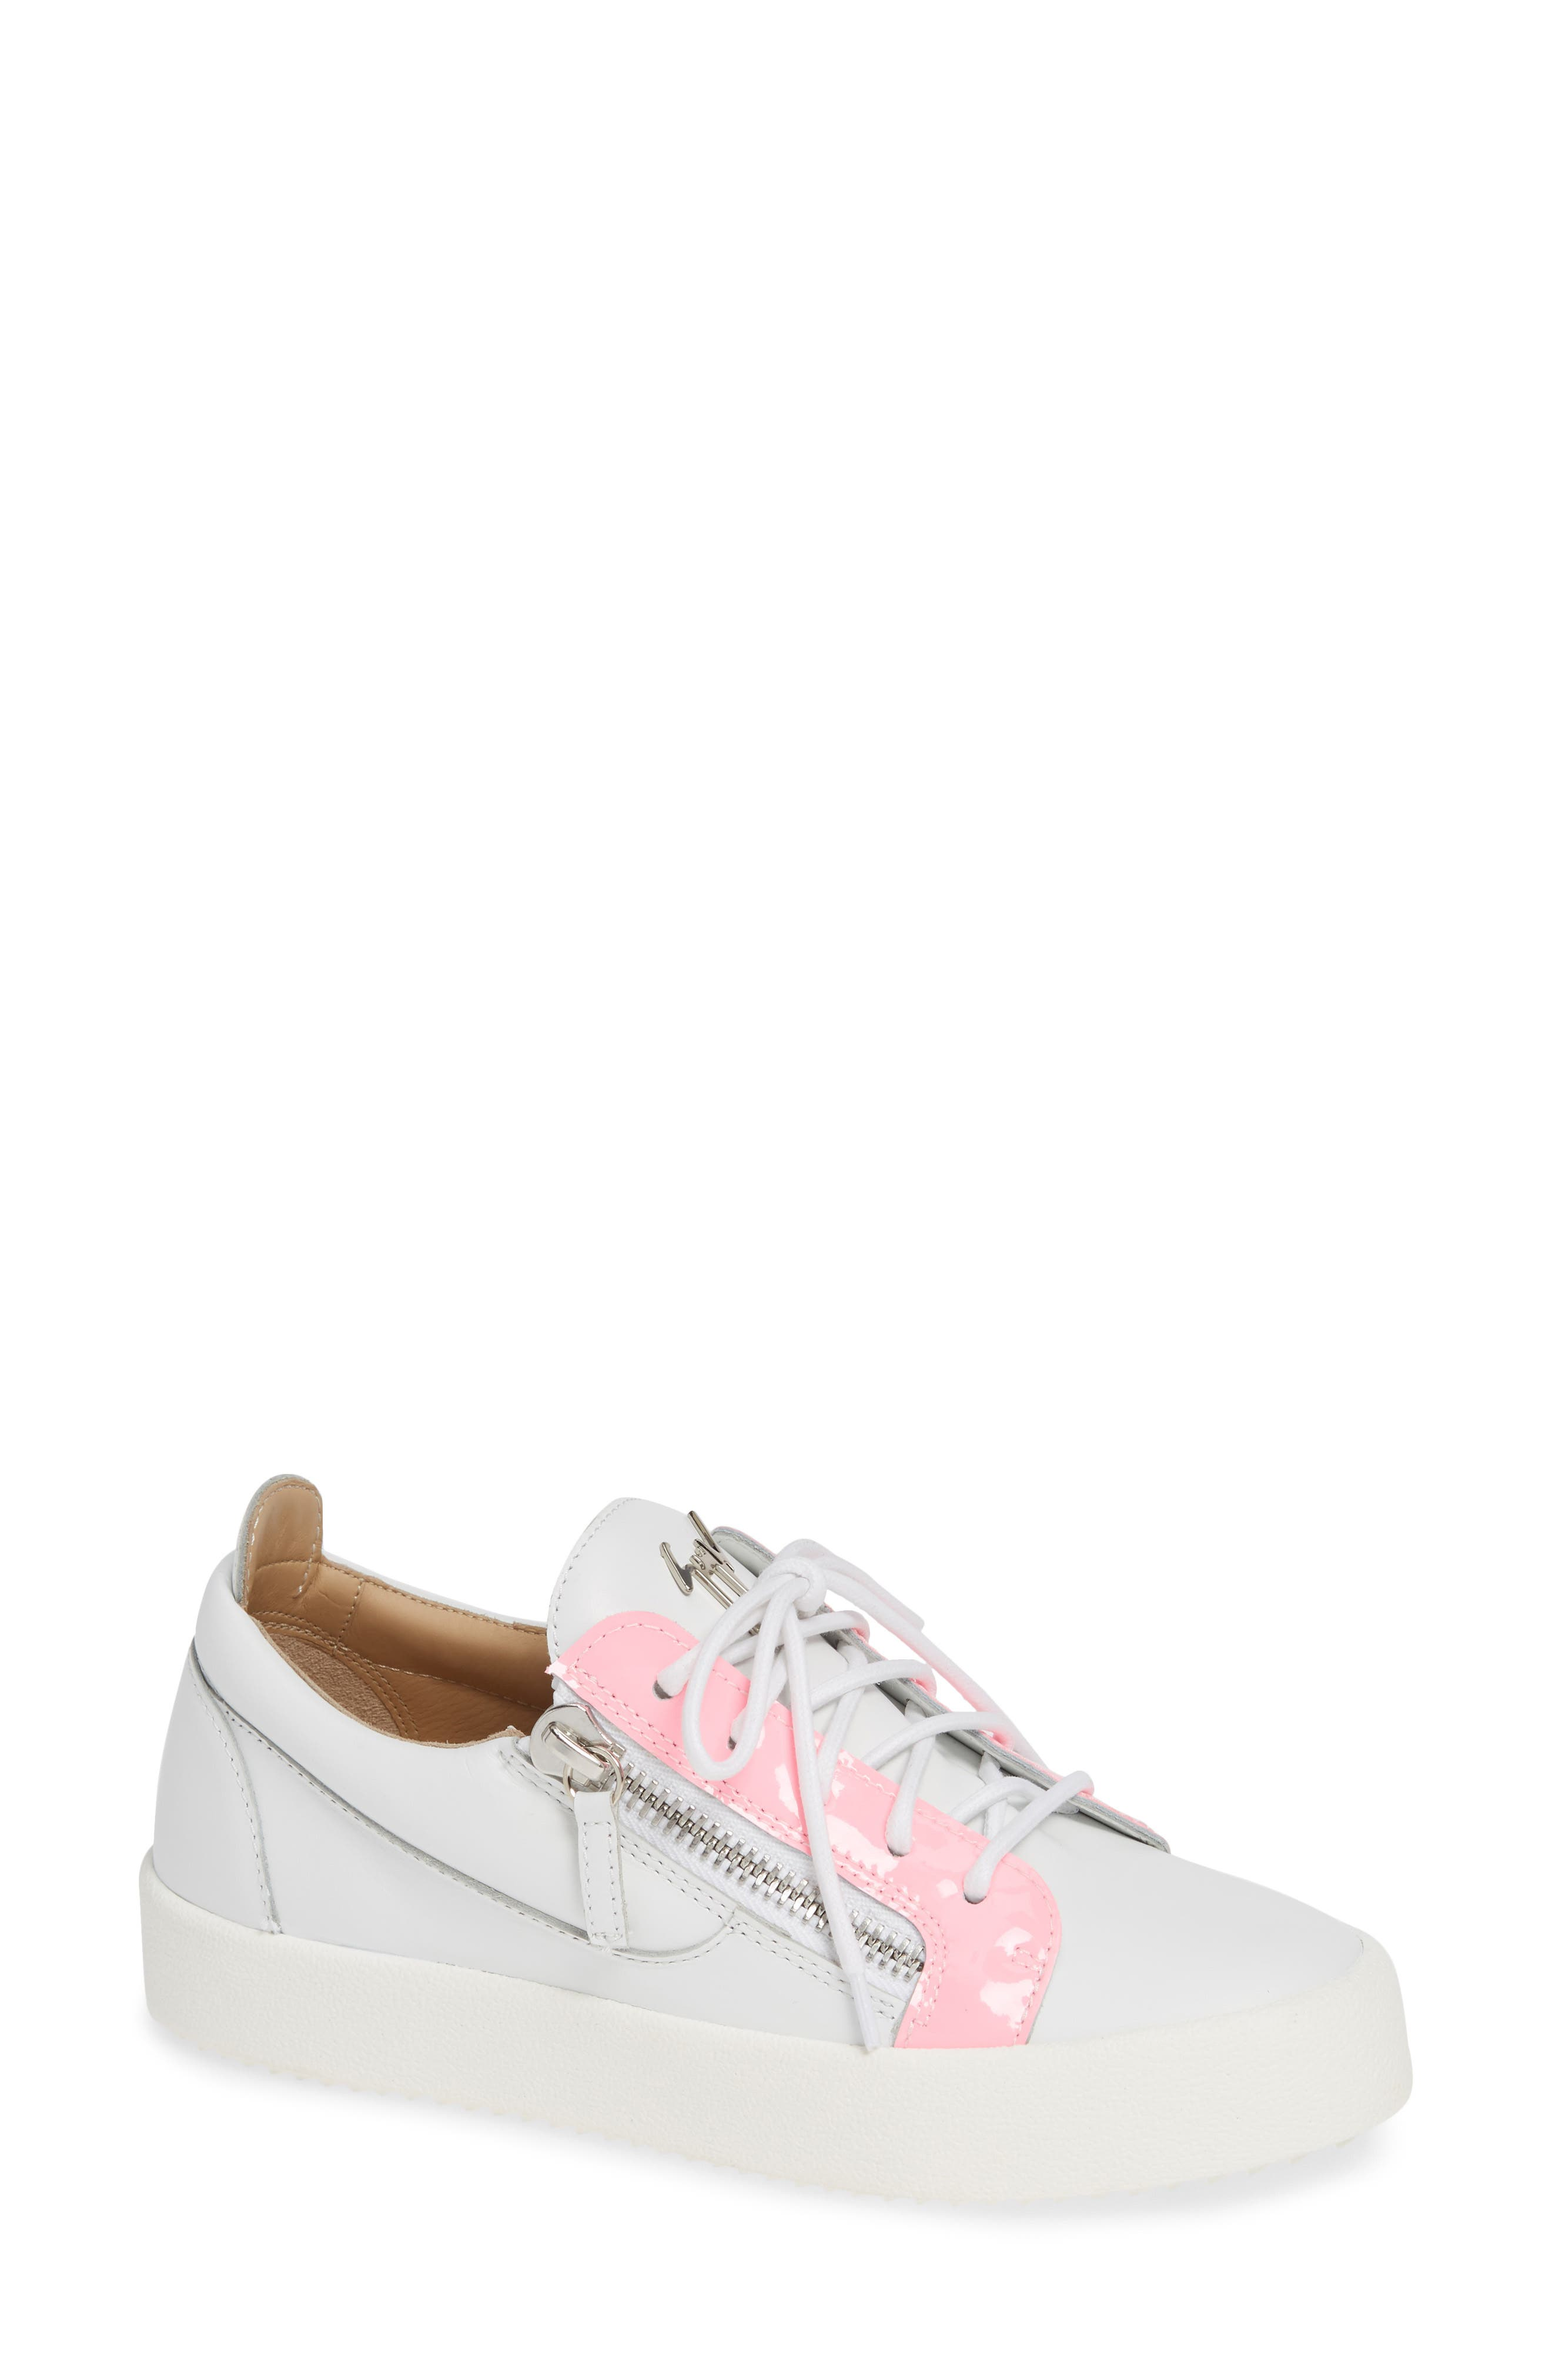 Low Top Sneaker,                             Main thumbnail 1, color,                             WHITE/ FUCHSIA